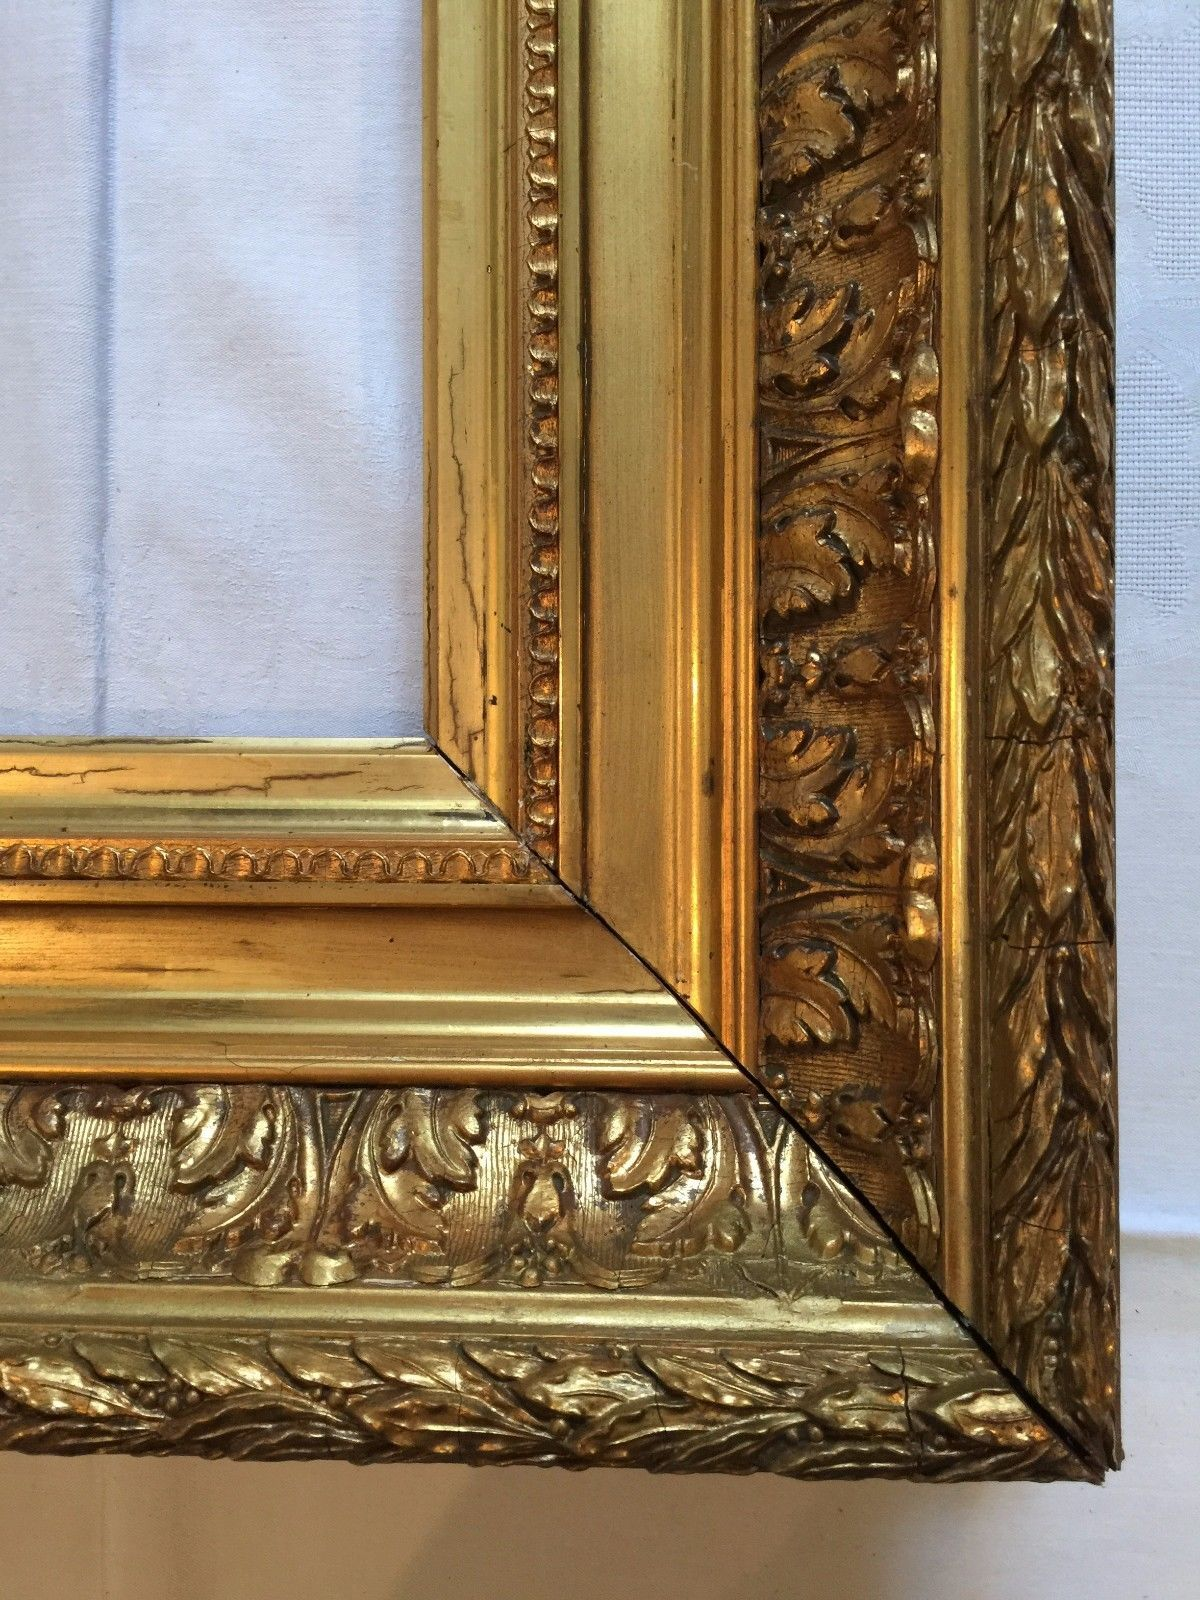 Bilderrahmen Prunkrahmen echt vergoldet Holz Stuck Frankreich um ...